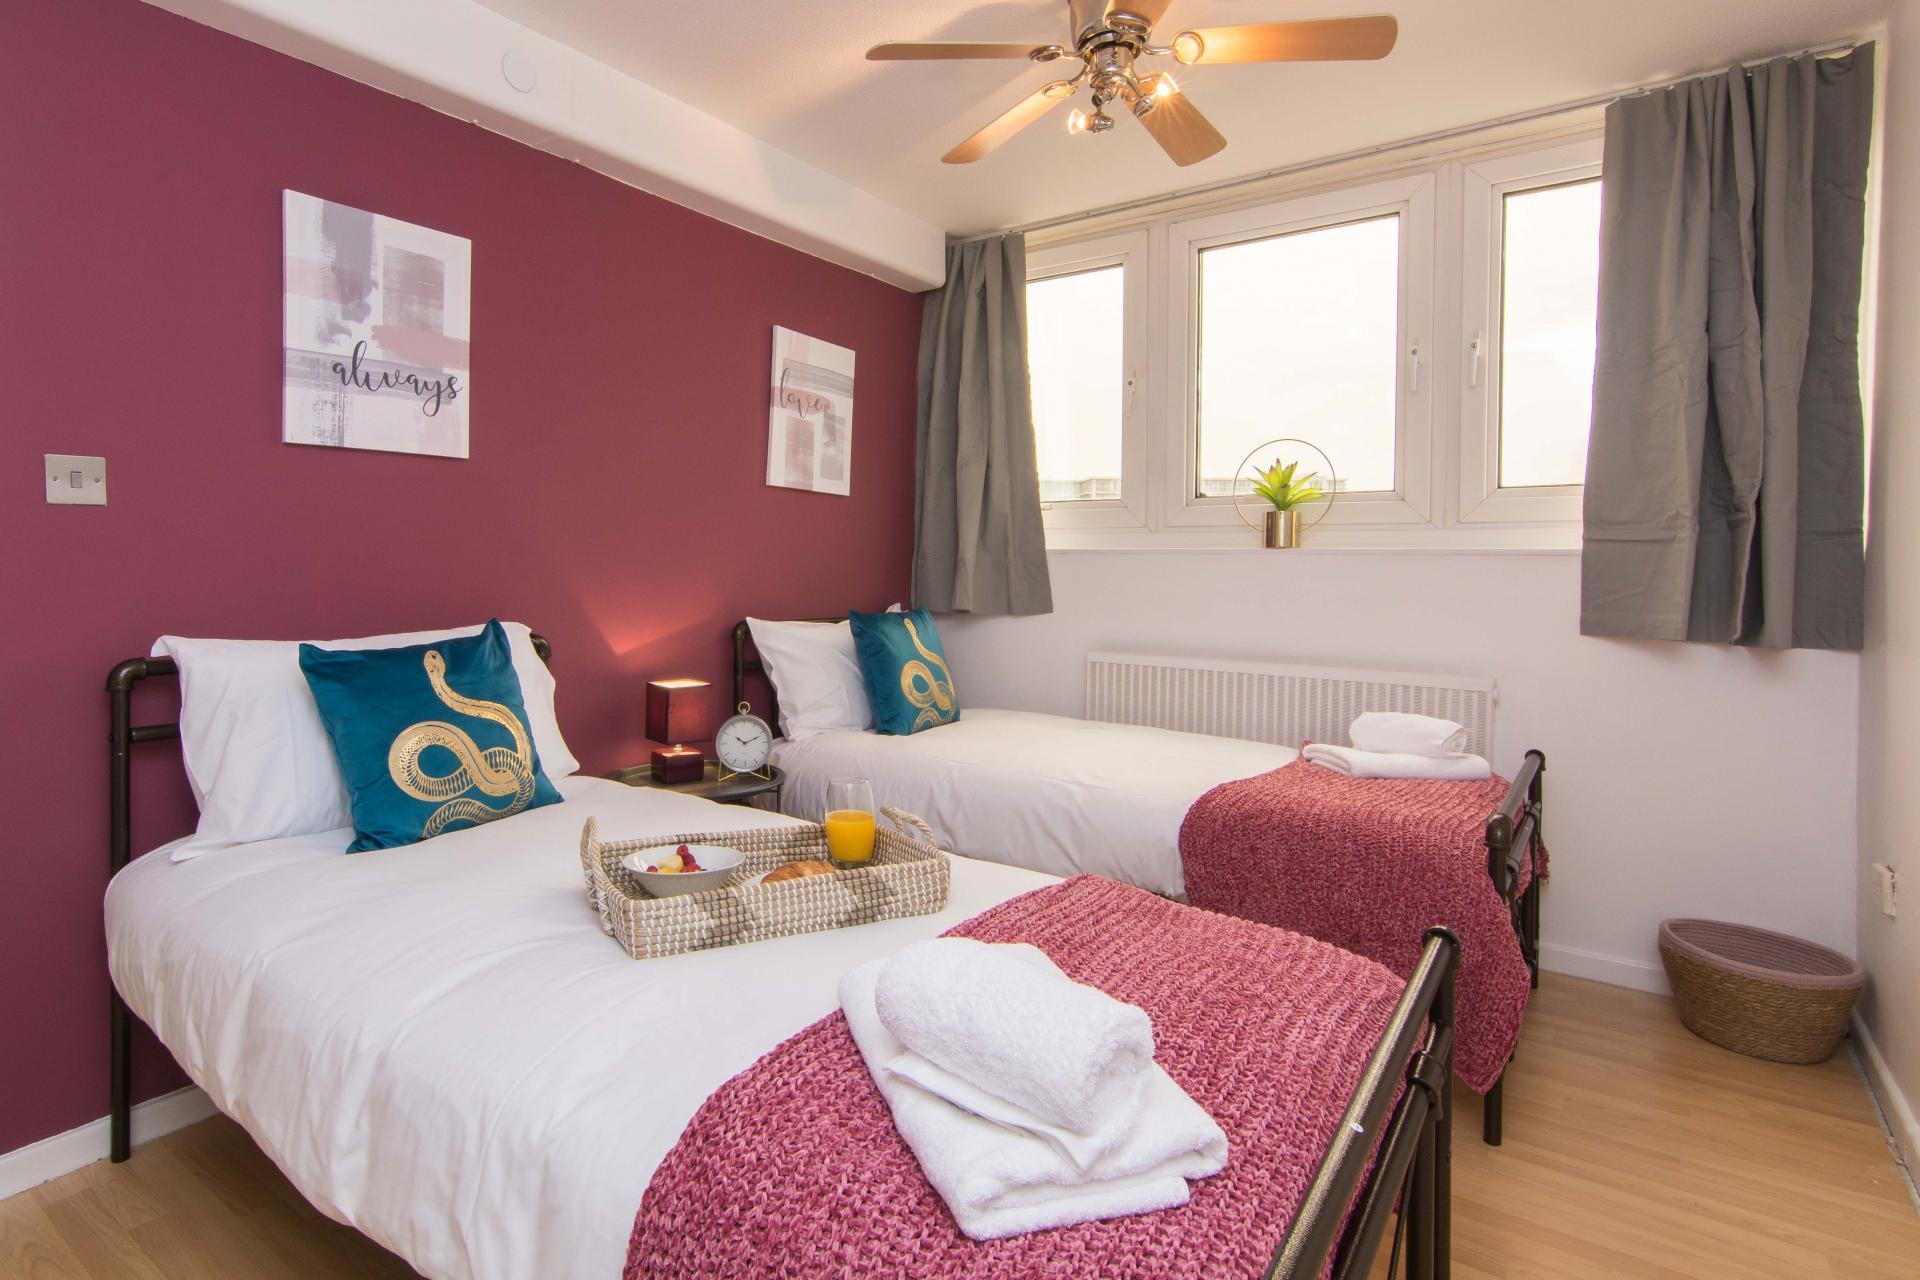 Beds at Victoria Centre Apartment, Centre, Nottingham - Citybase Apartments